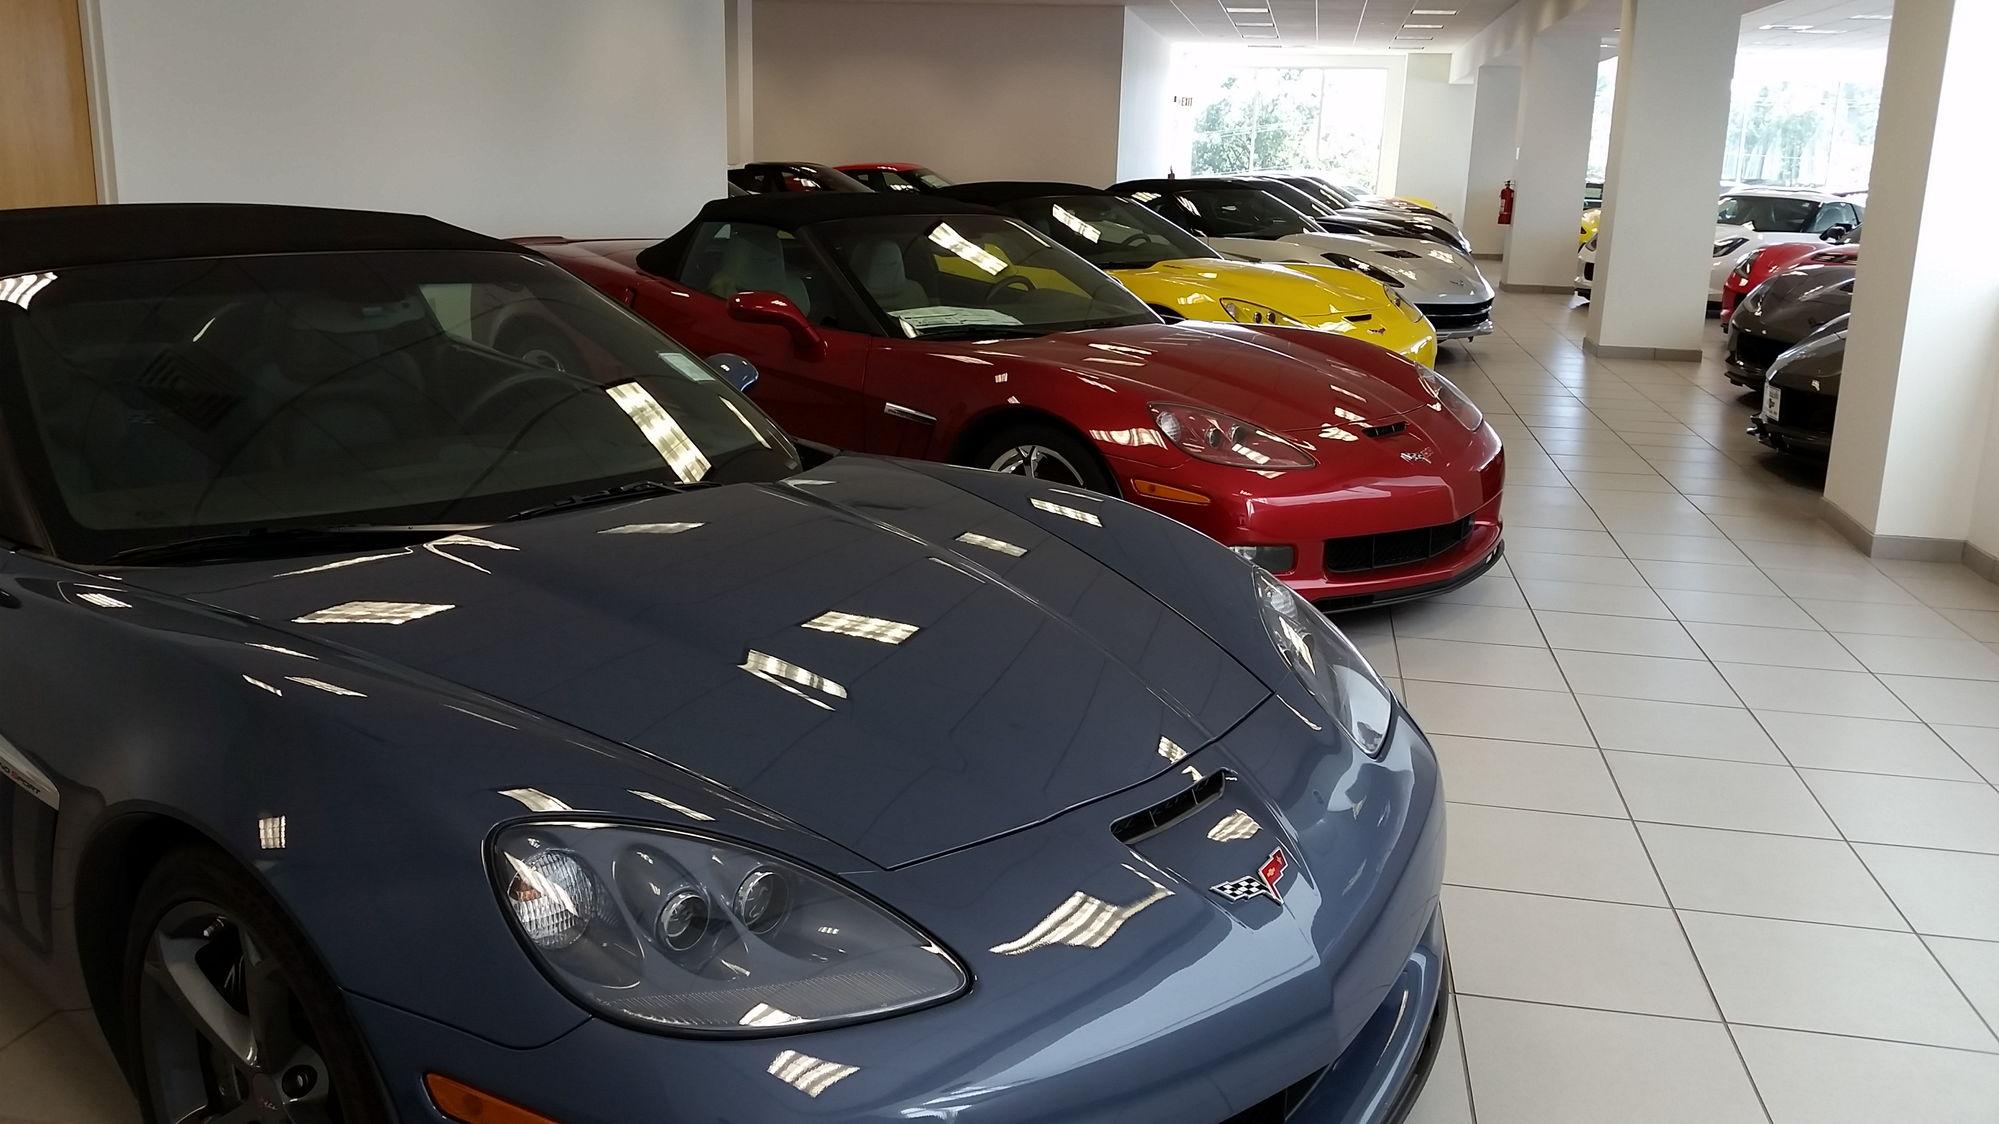 Karl Kustom Corvettes For Sale Upcomingcarshq Com